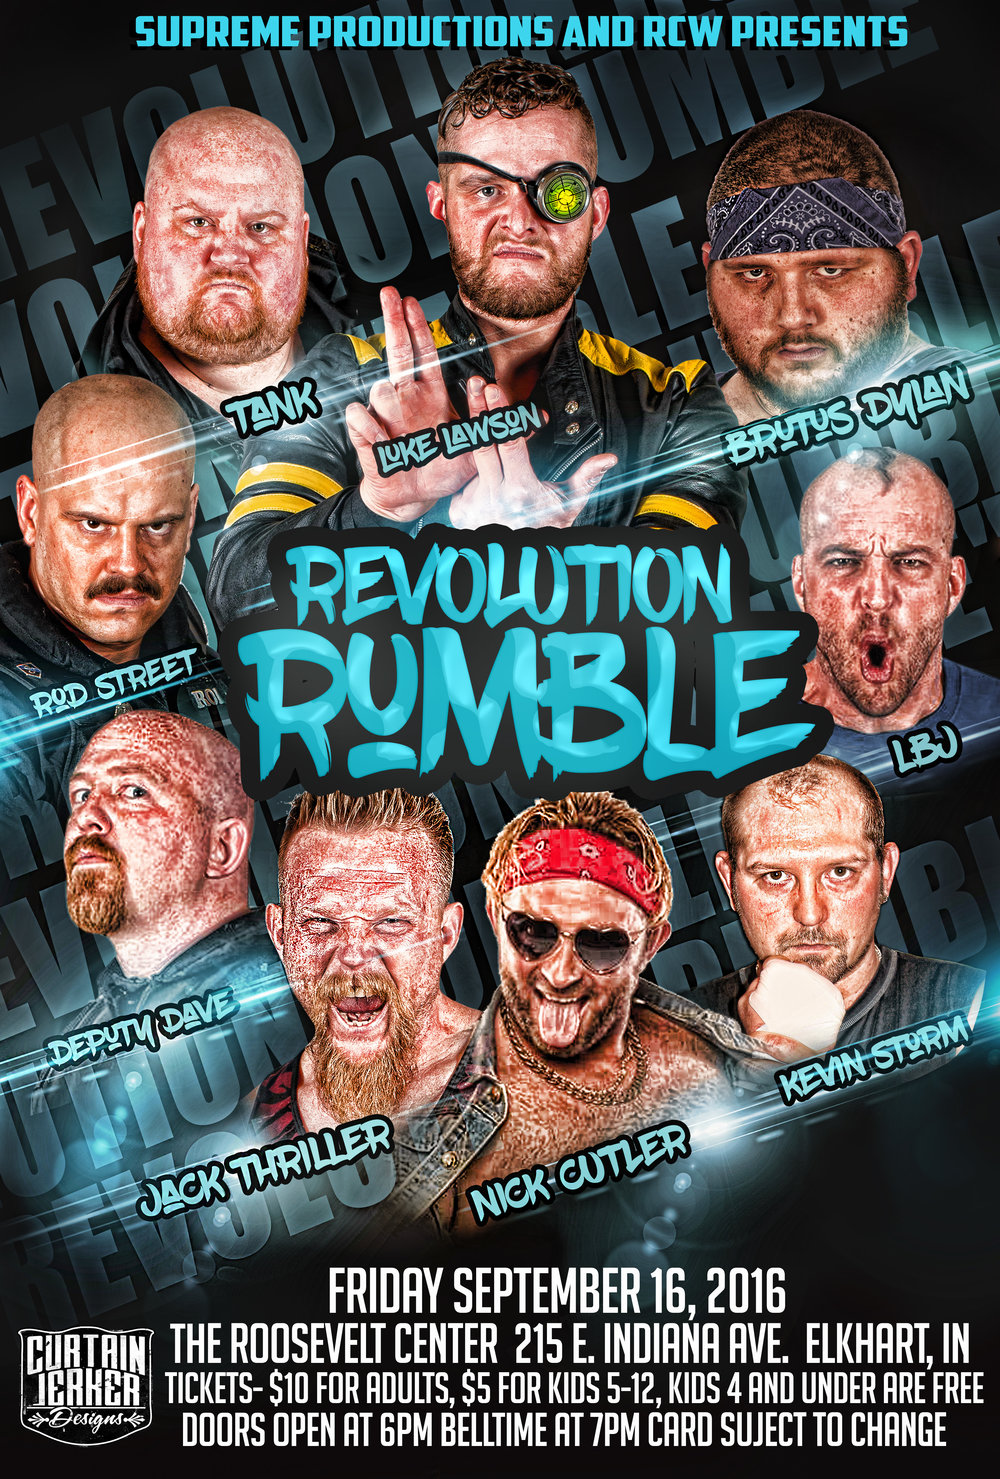 RCW+Revolution+Rumble+2016-+Print+Marketing.jpg